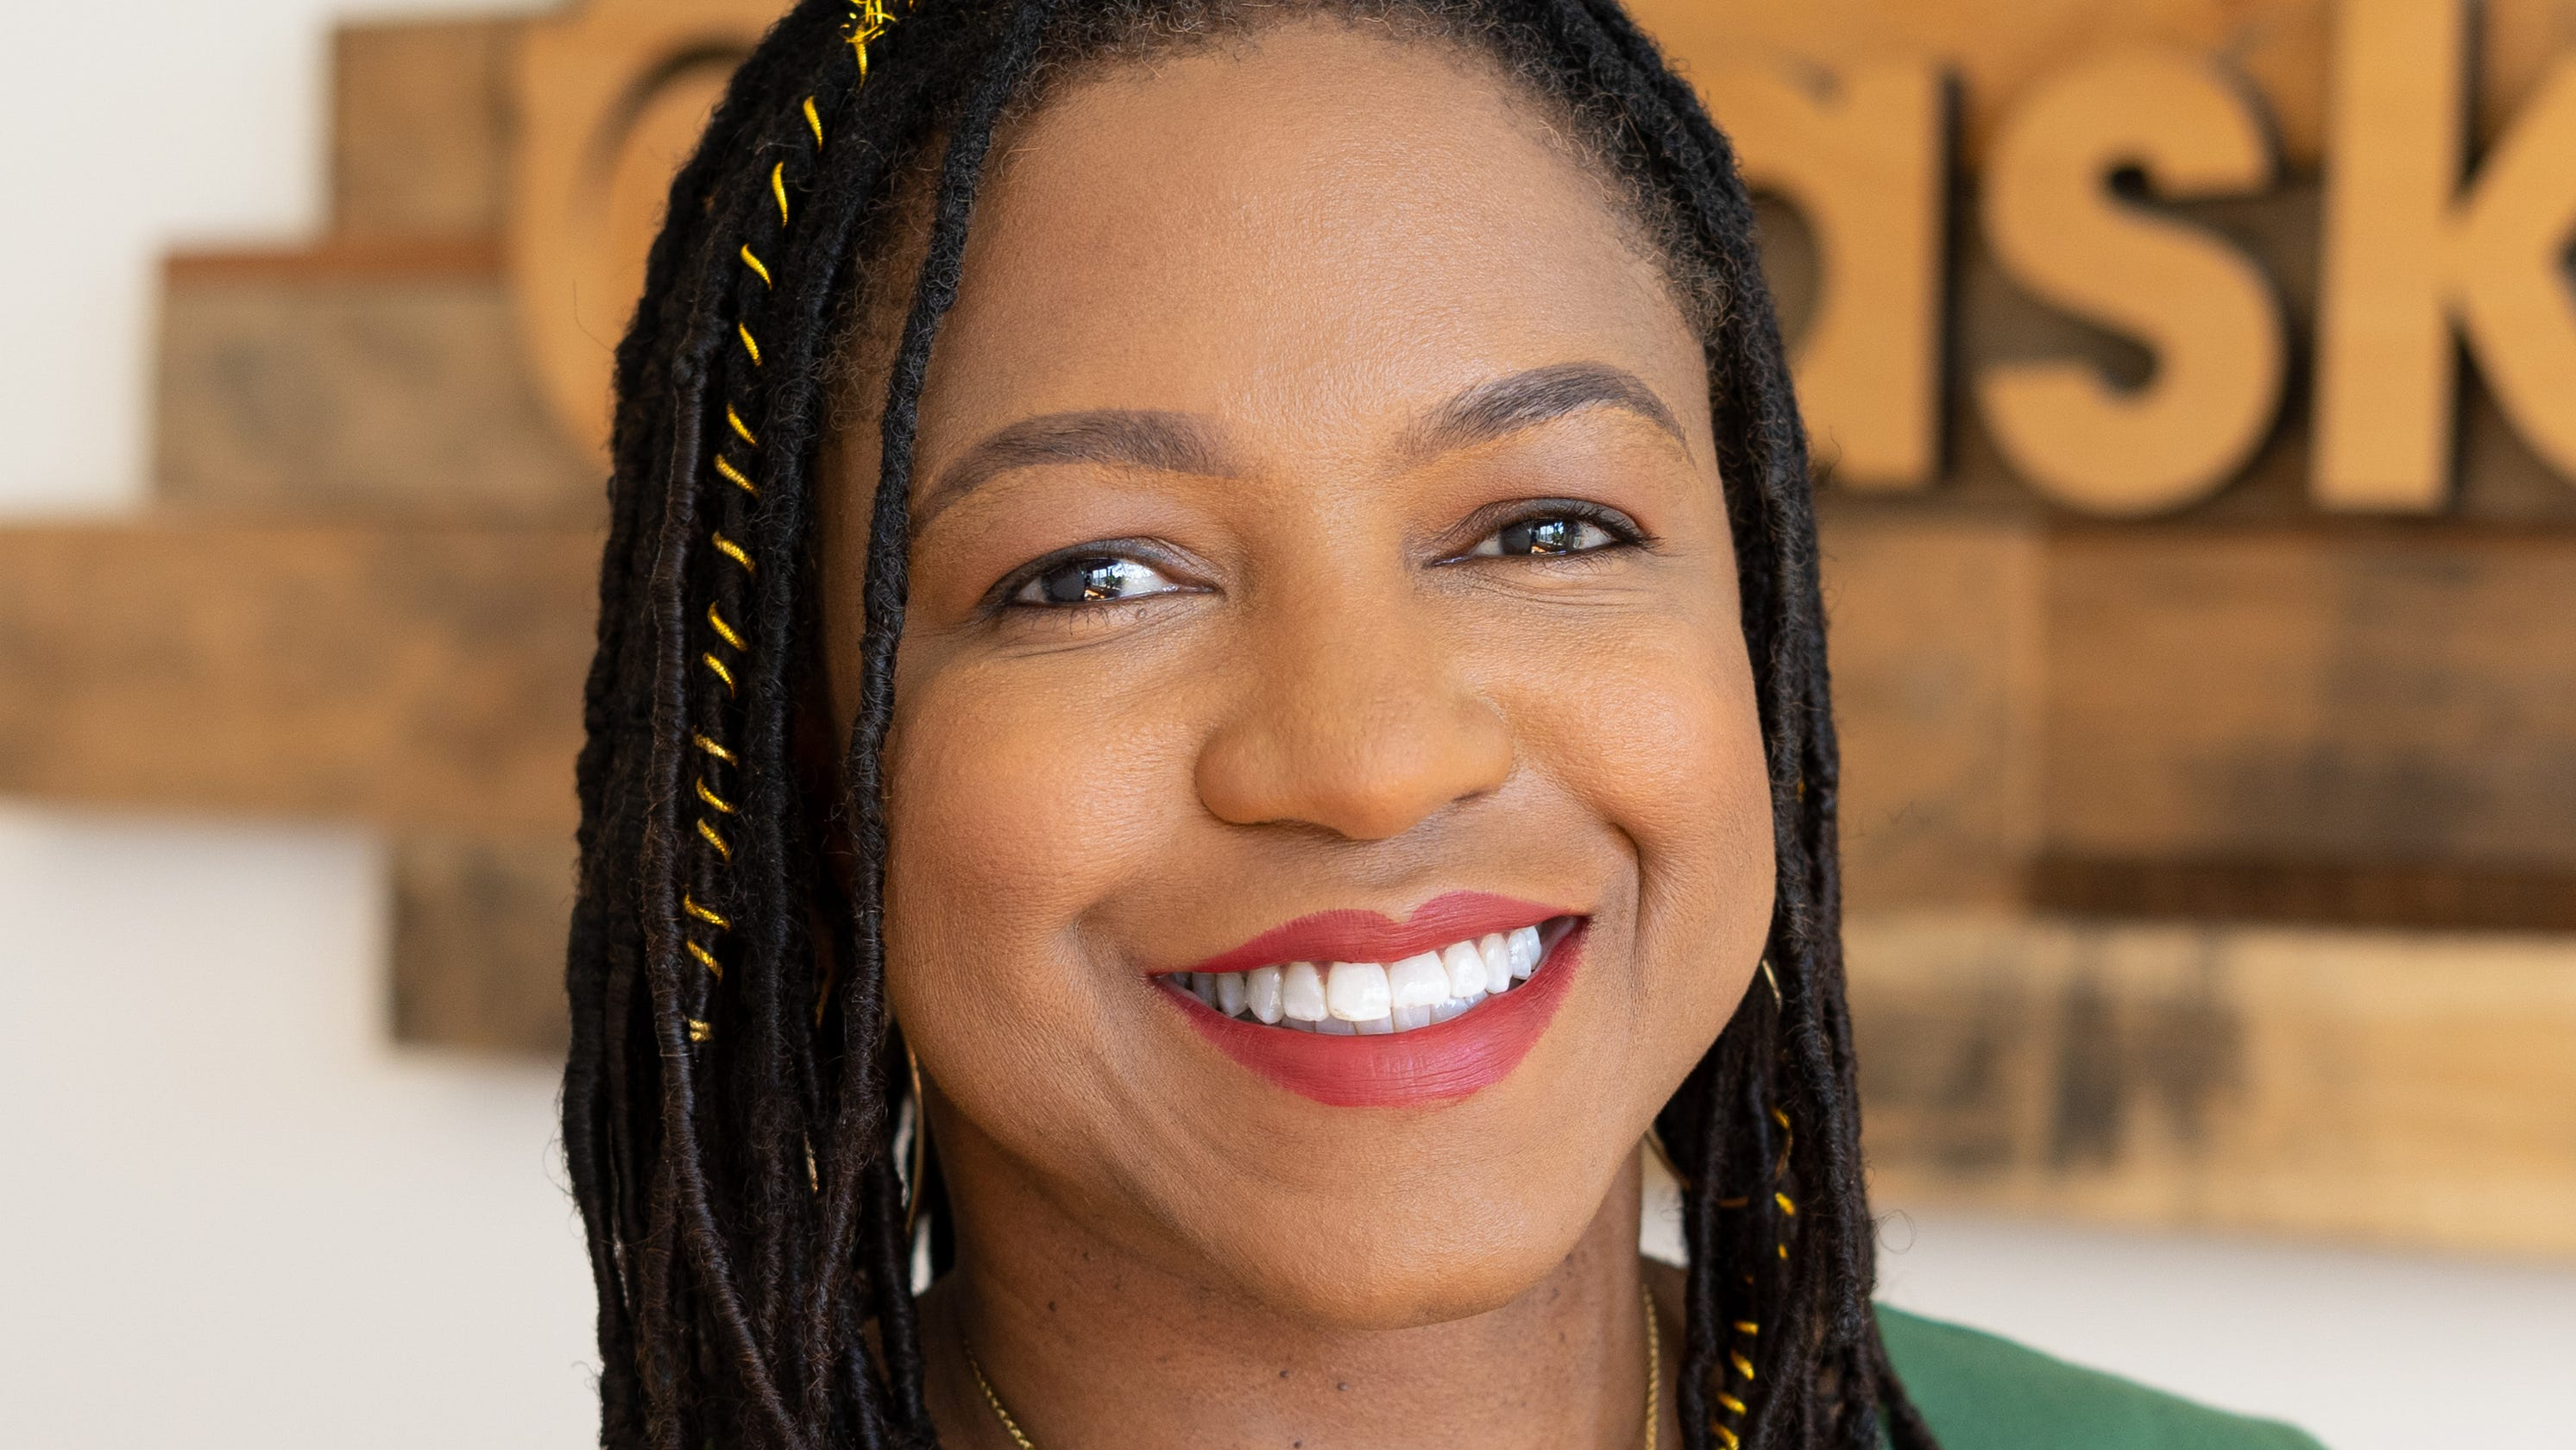 TaskRabbit CEO on tech, racism and George Floyd